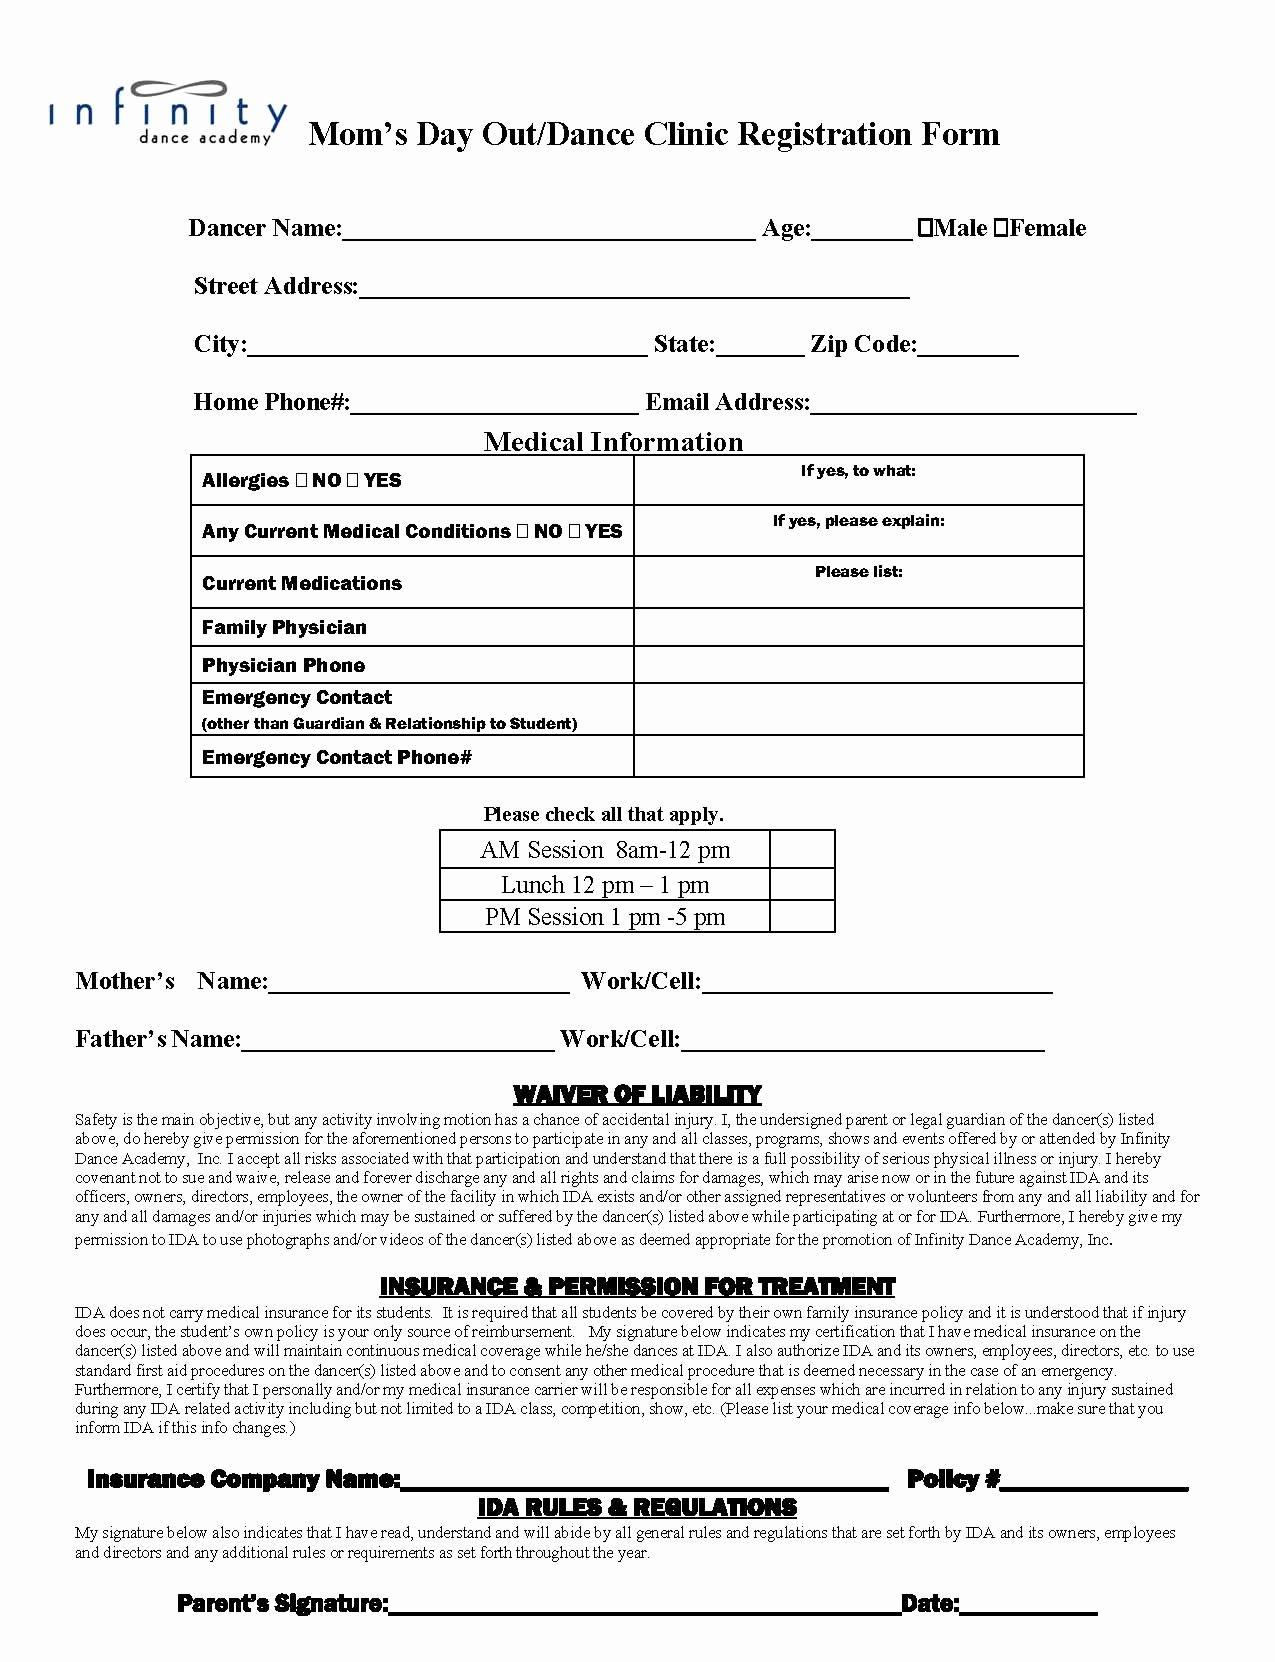 Dance Registration form Template New Dance School Wallpapers 51 Wallpapers – Wallpapers for